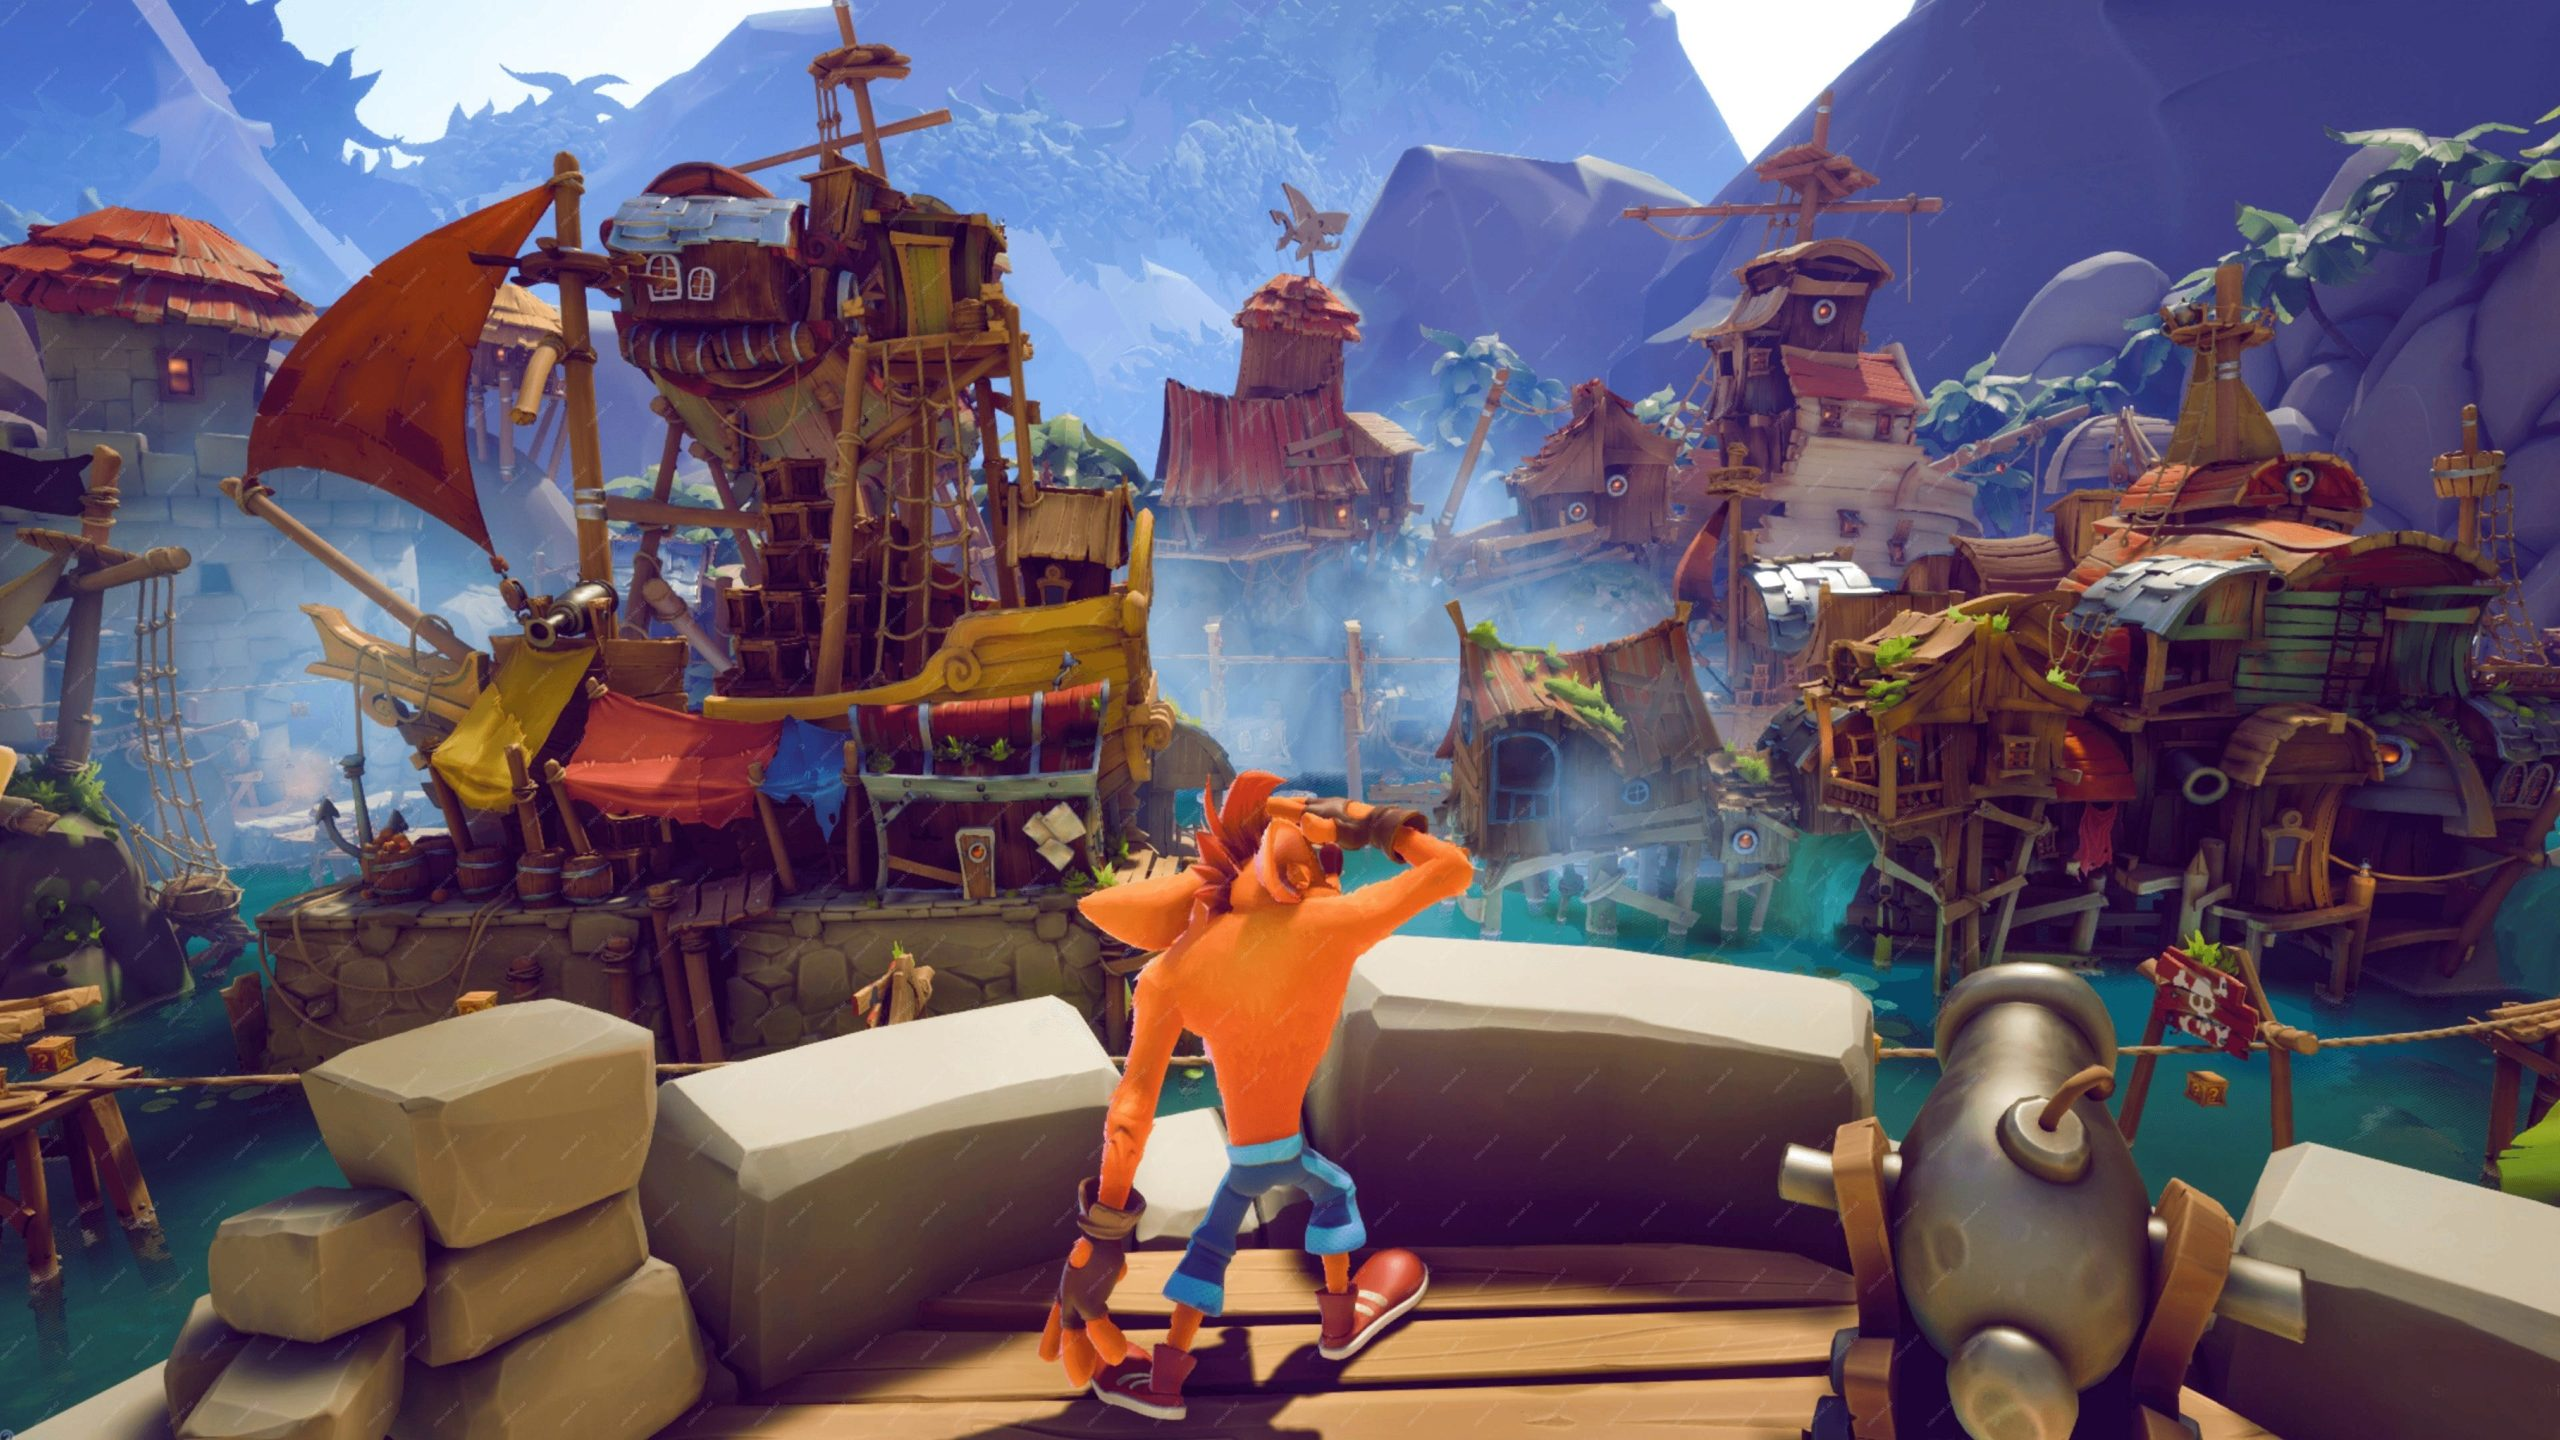 Crash Bandicoot 4 dostal nový trailer na demoverzi